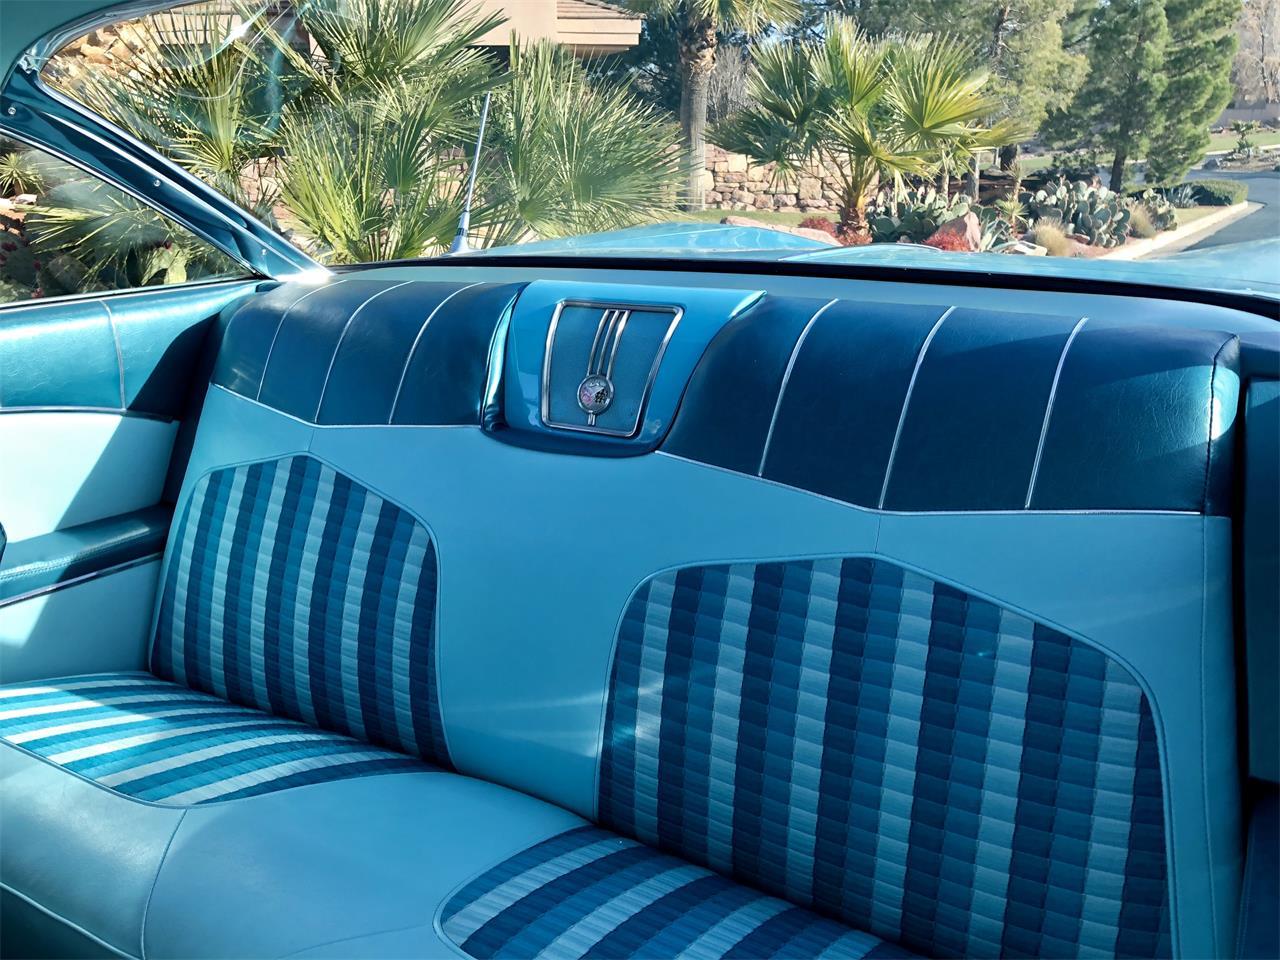 Car Dealers St George Utah >> 1959 Chevrolet Impala for Sale | ClassicCars.com | CC-1063295